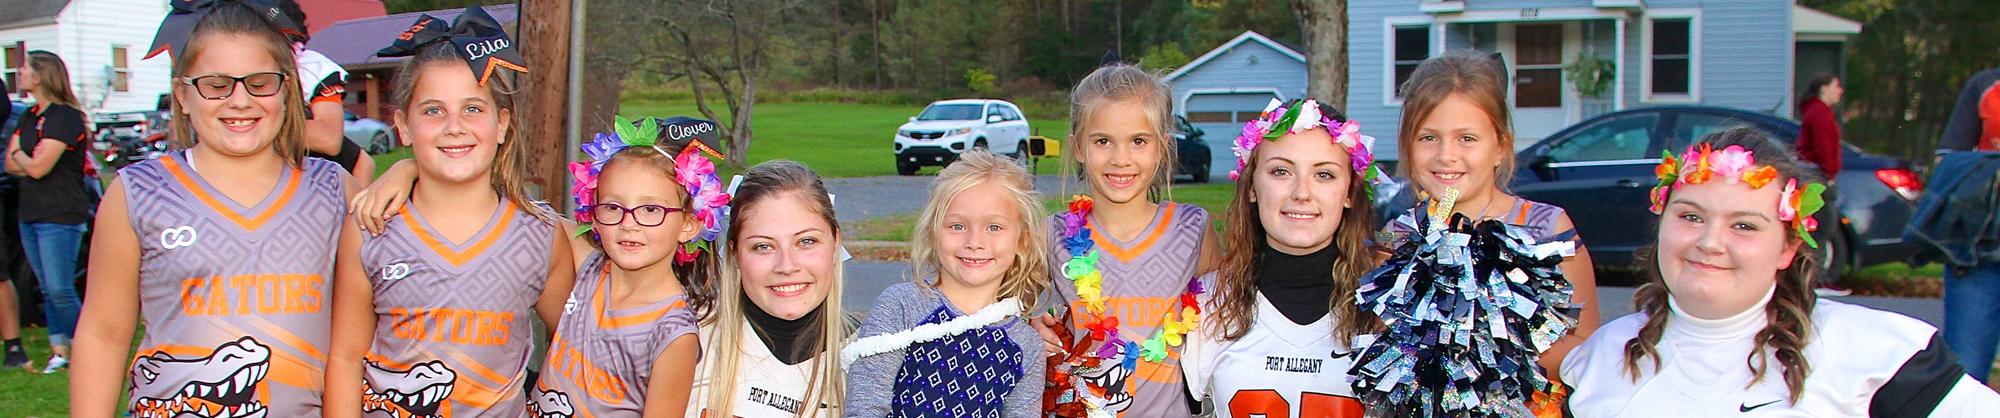 group of elementary and high school cheerleaders